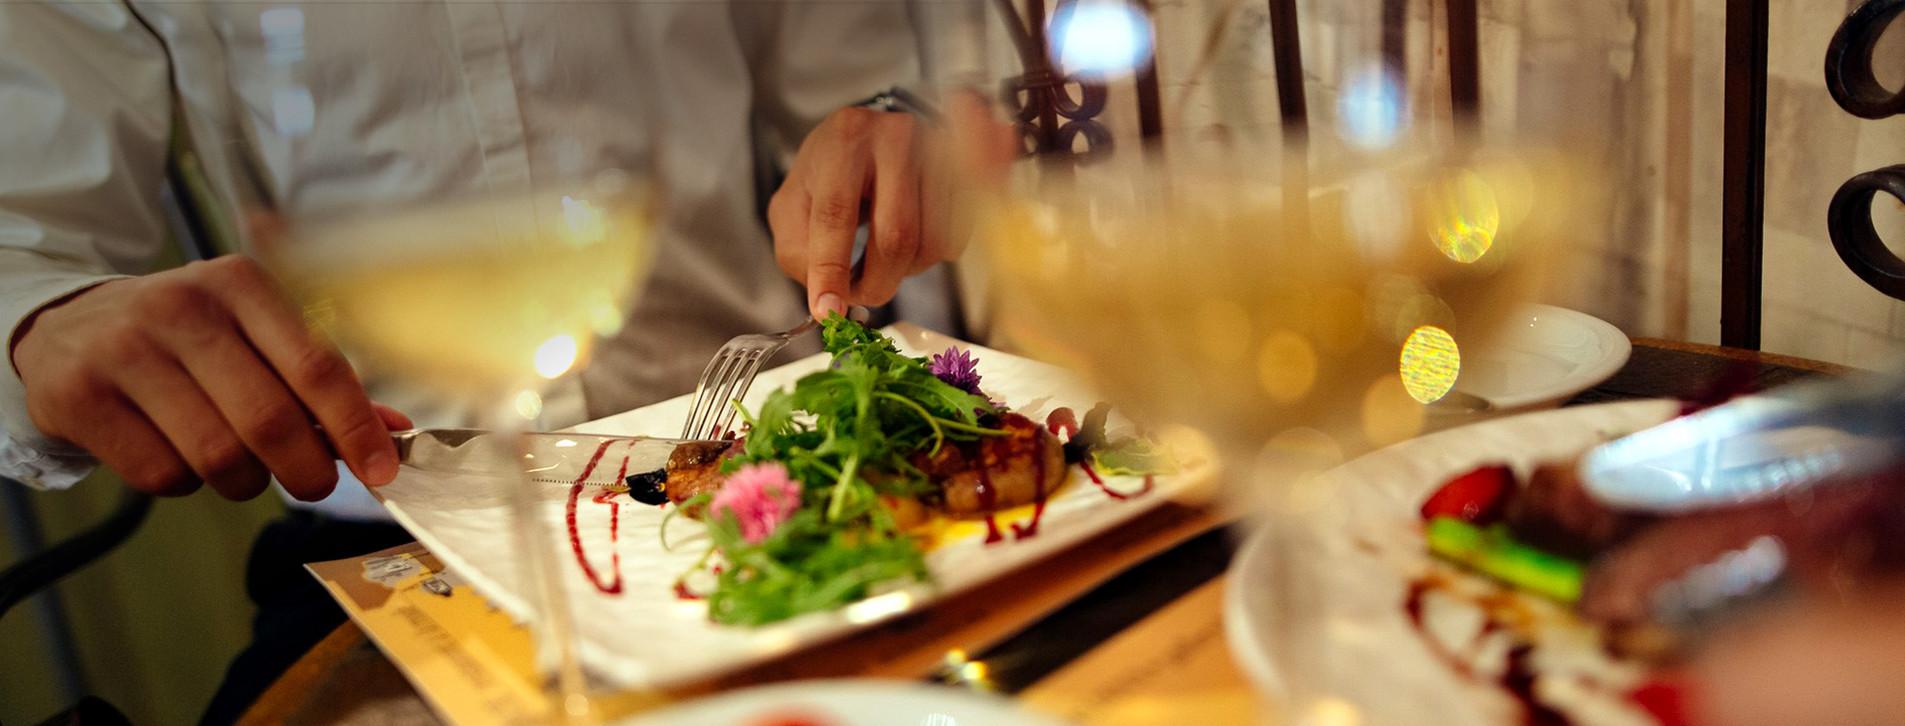 Фото 1 - Ужин во французском ресторане